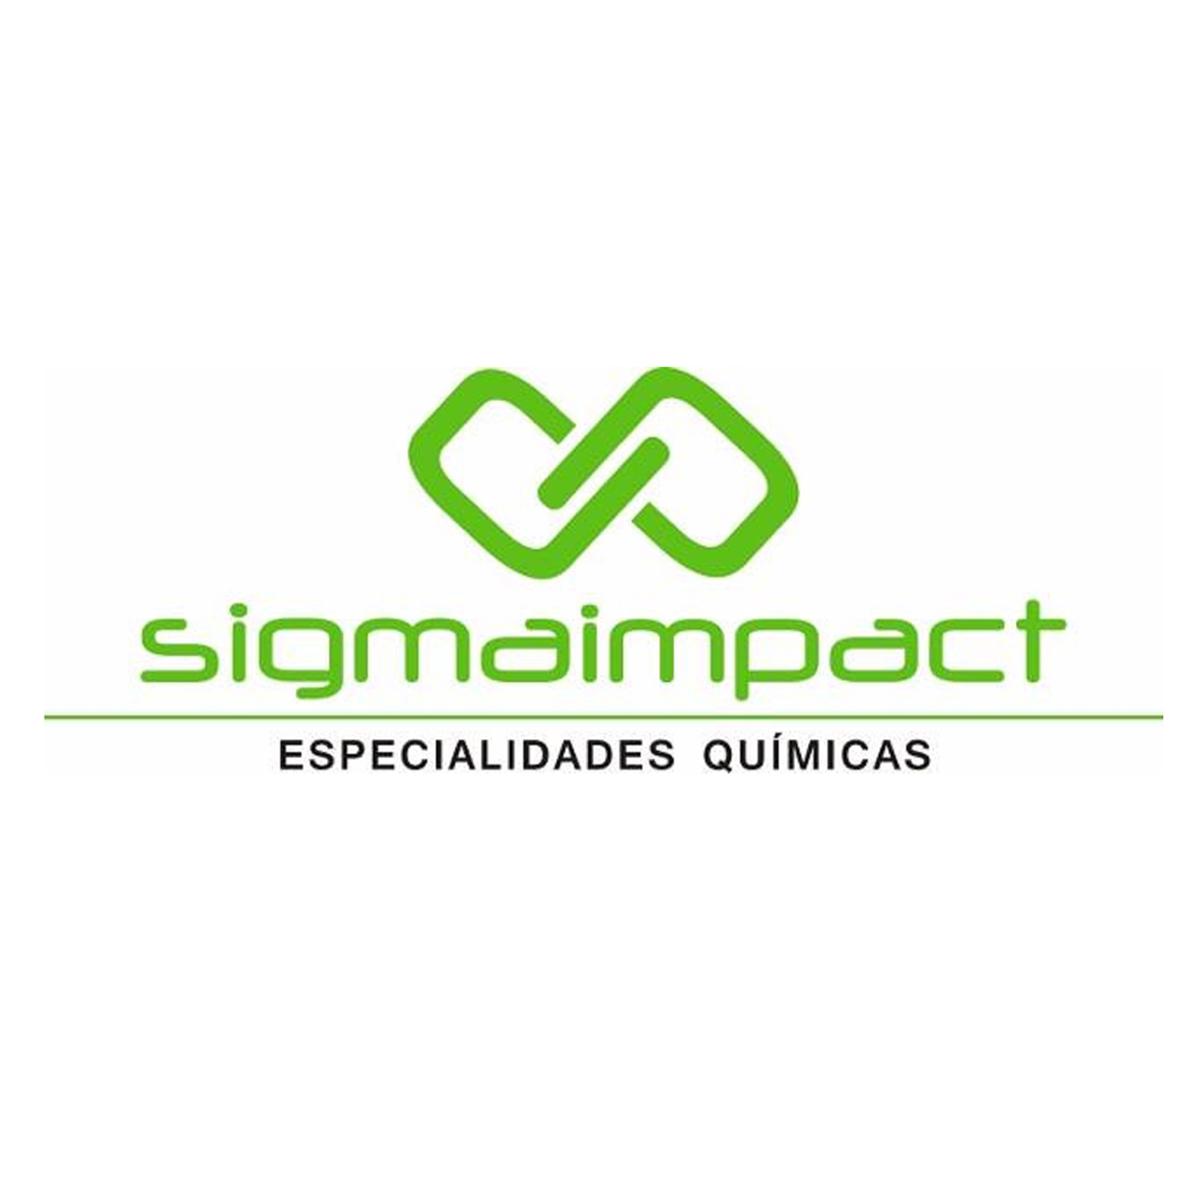 Sigmaimpact - Especialidades Químicas